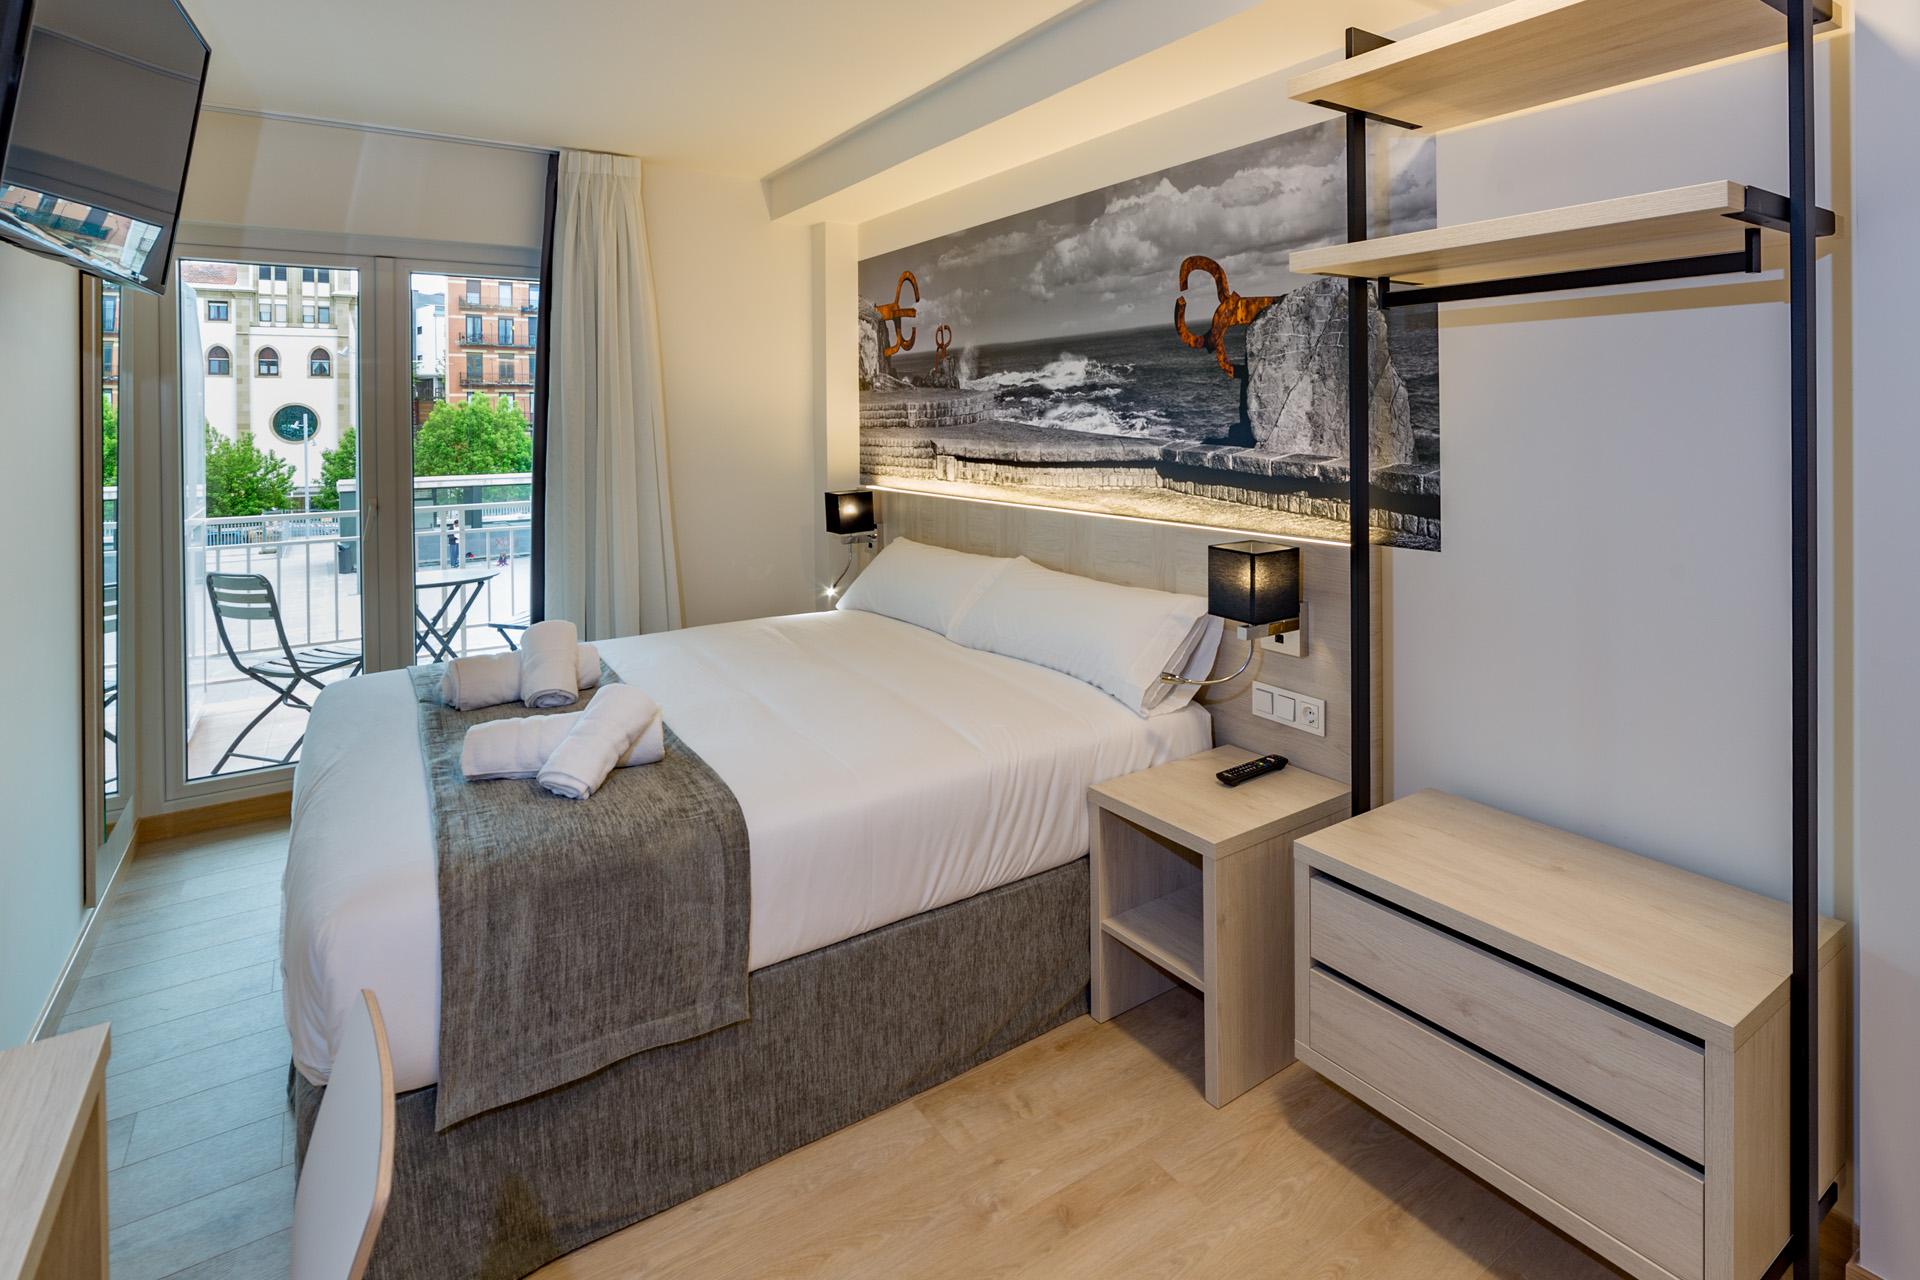 atotxa rooms pension in san sebastian zentrum. Black Bedroom Furniture Sets. Home Design Ideas